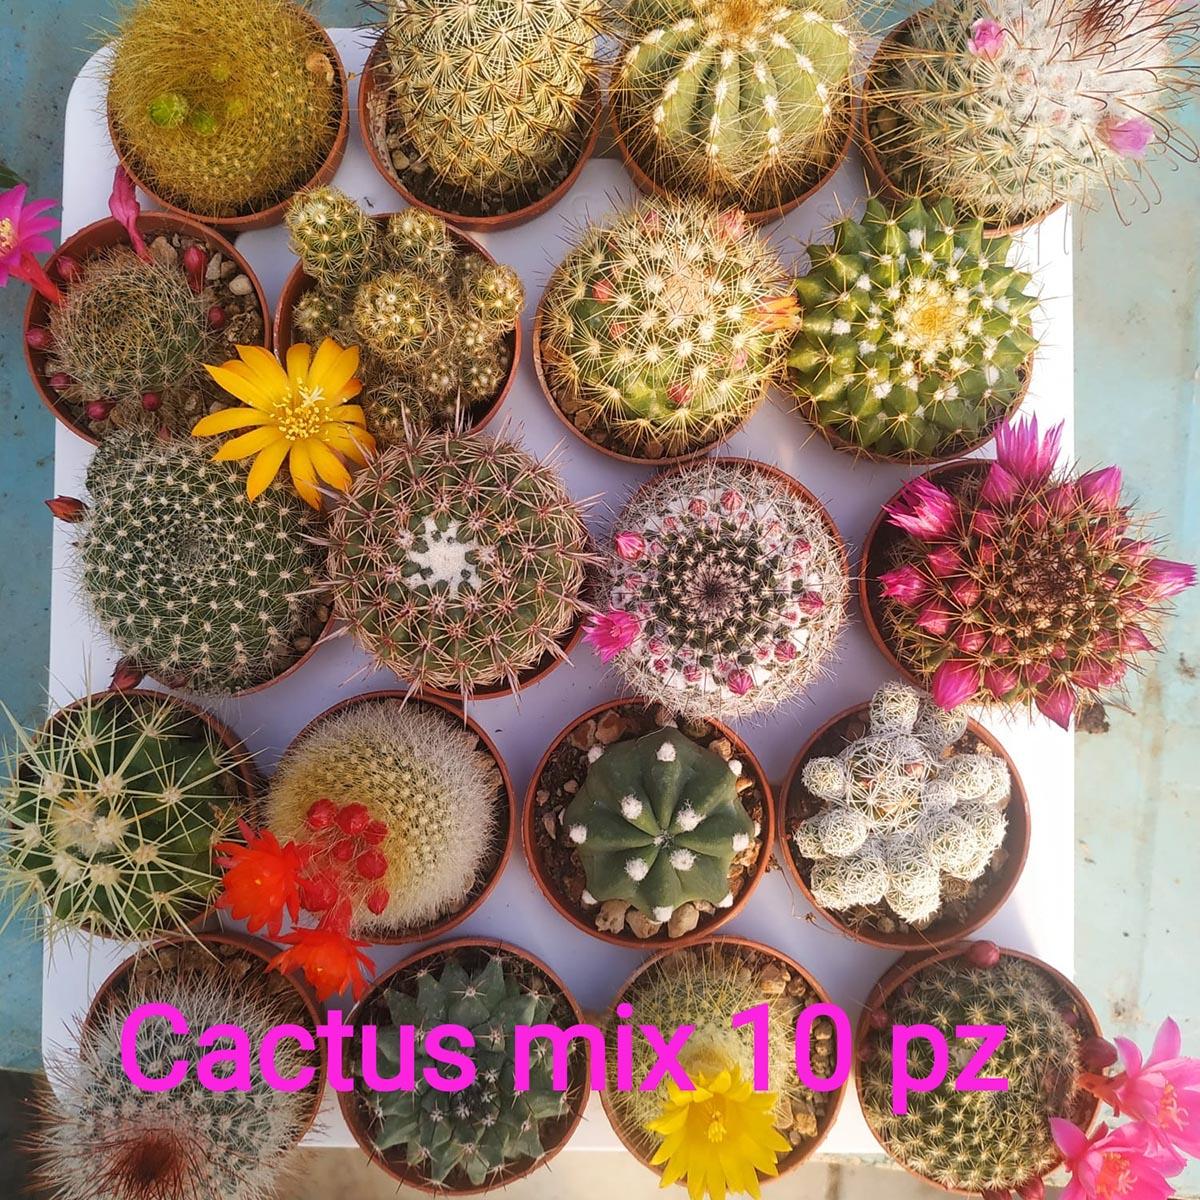 eden plantae cactaceae mix 10